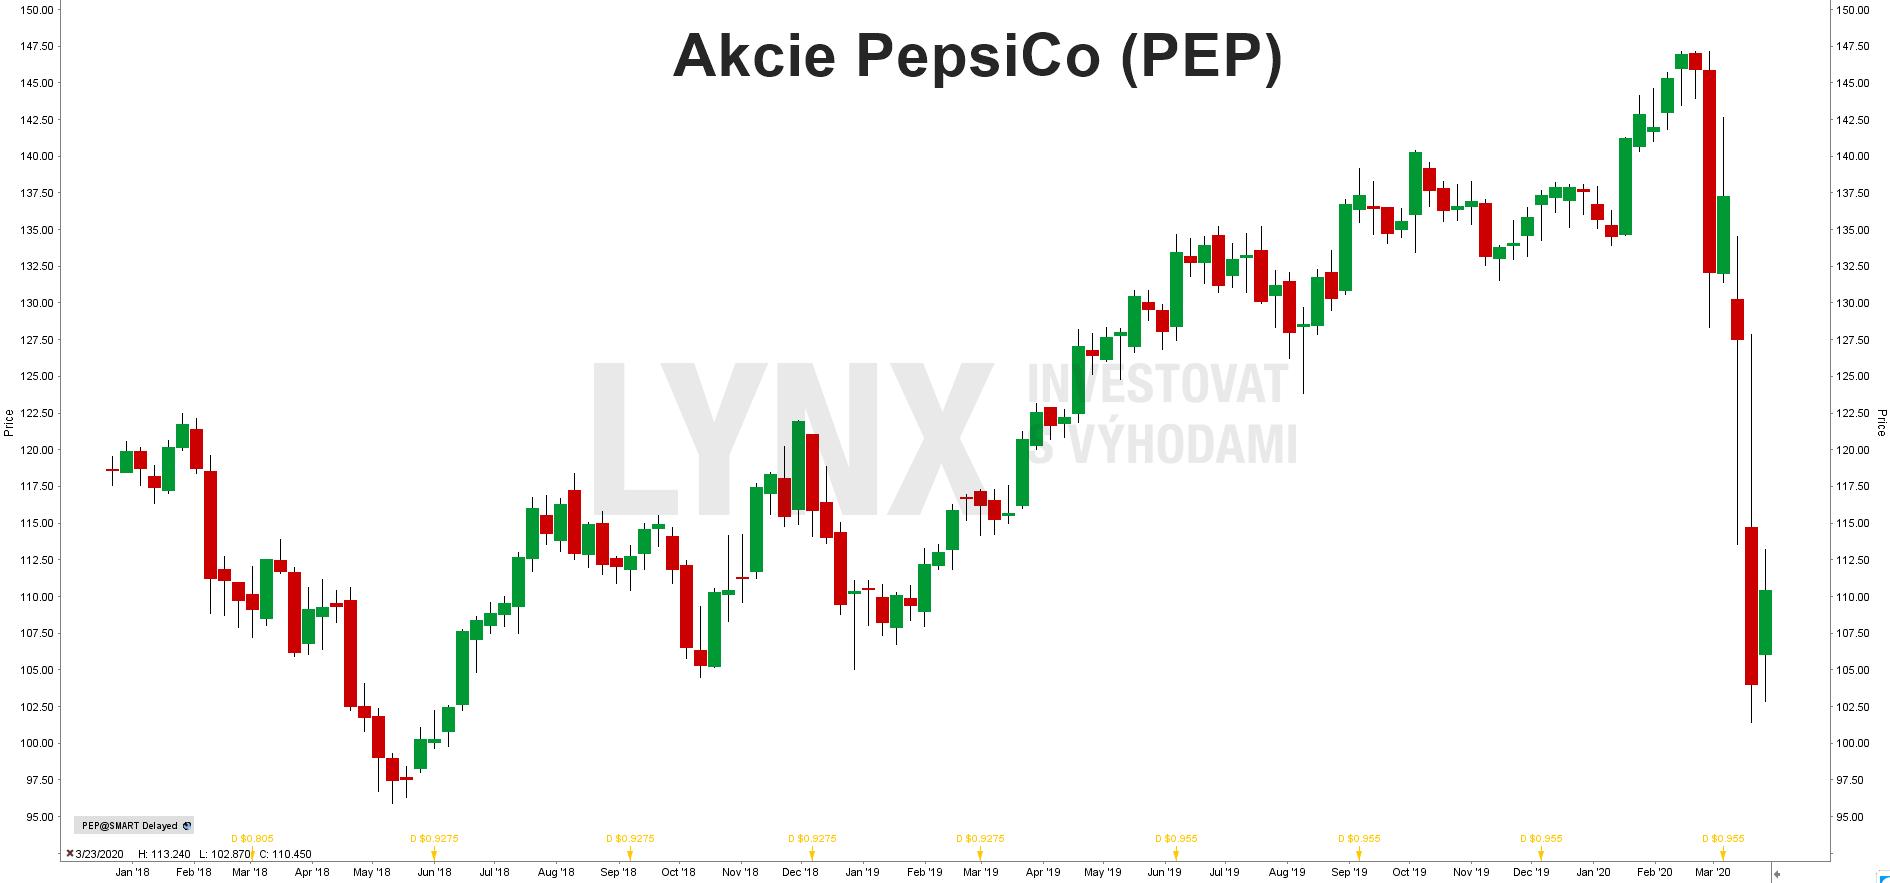 Akcie PepsiCo (PEP)